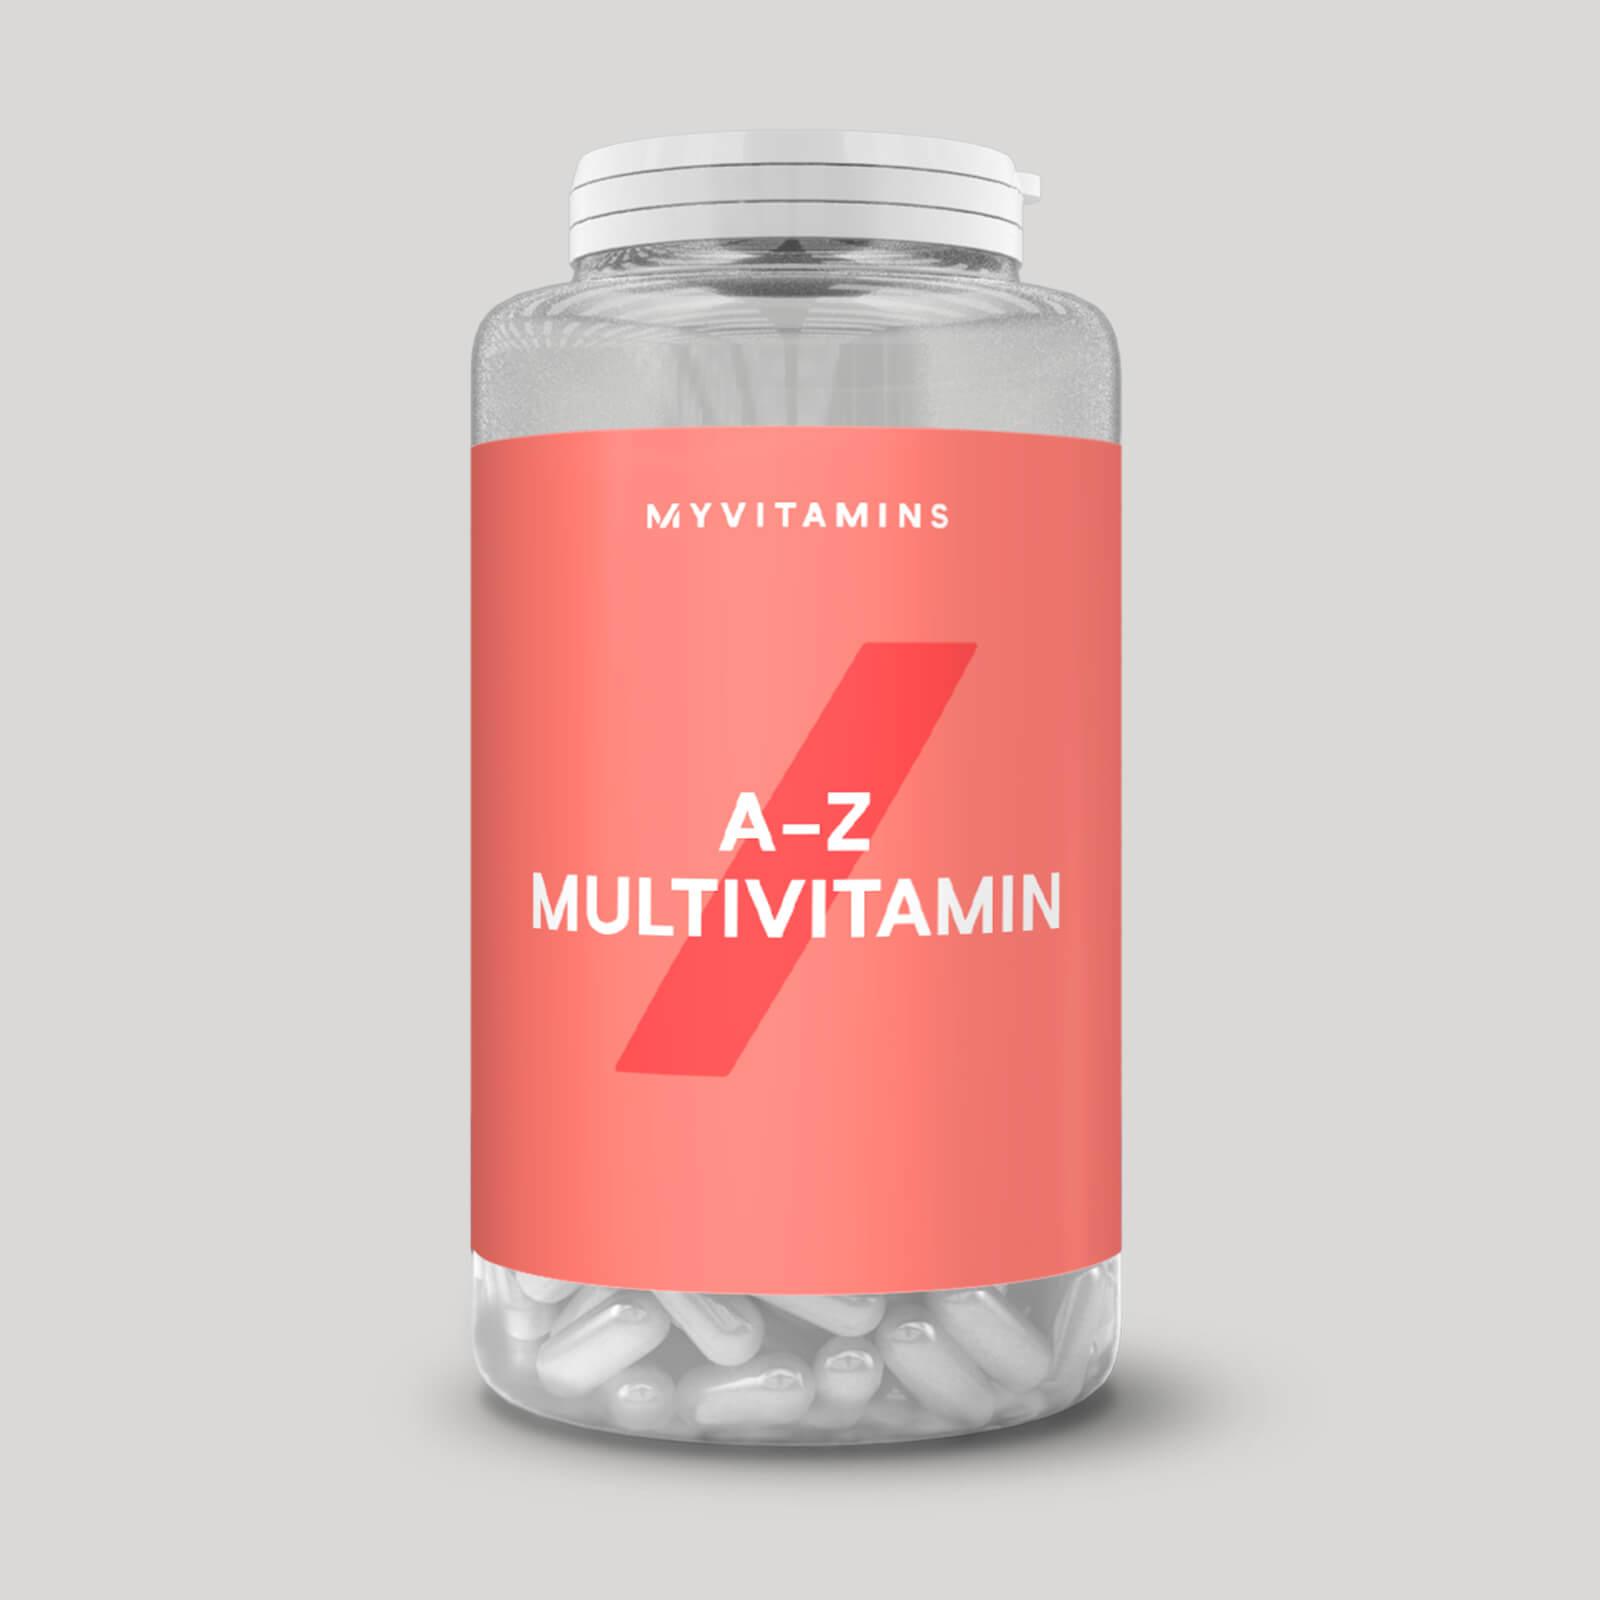 Myprotein A-Z Multivitamin - 90Capsules